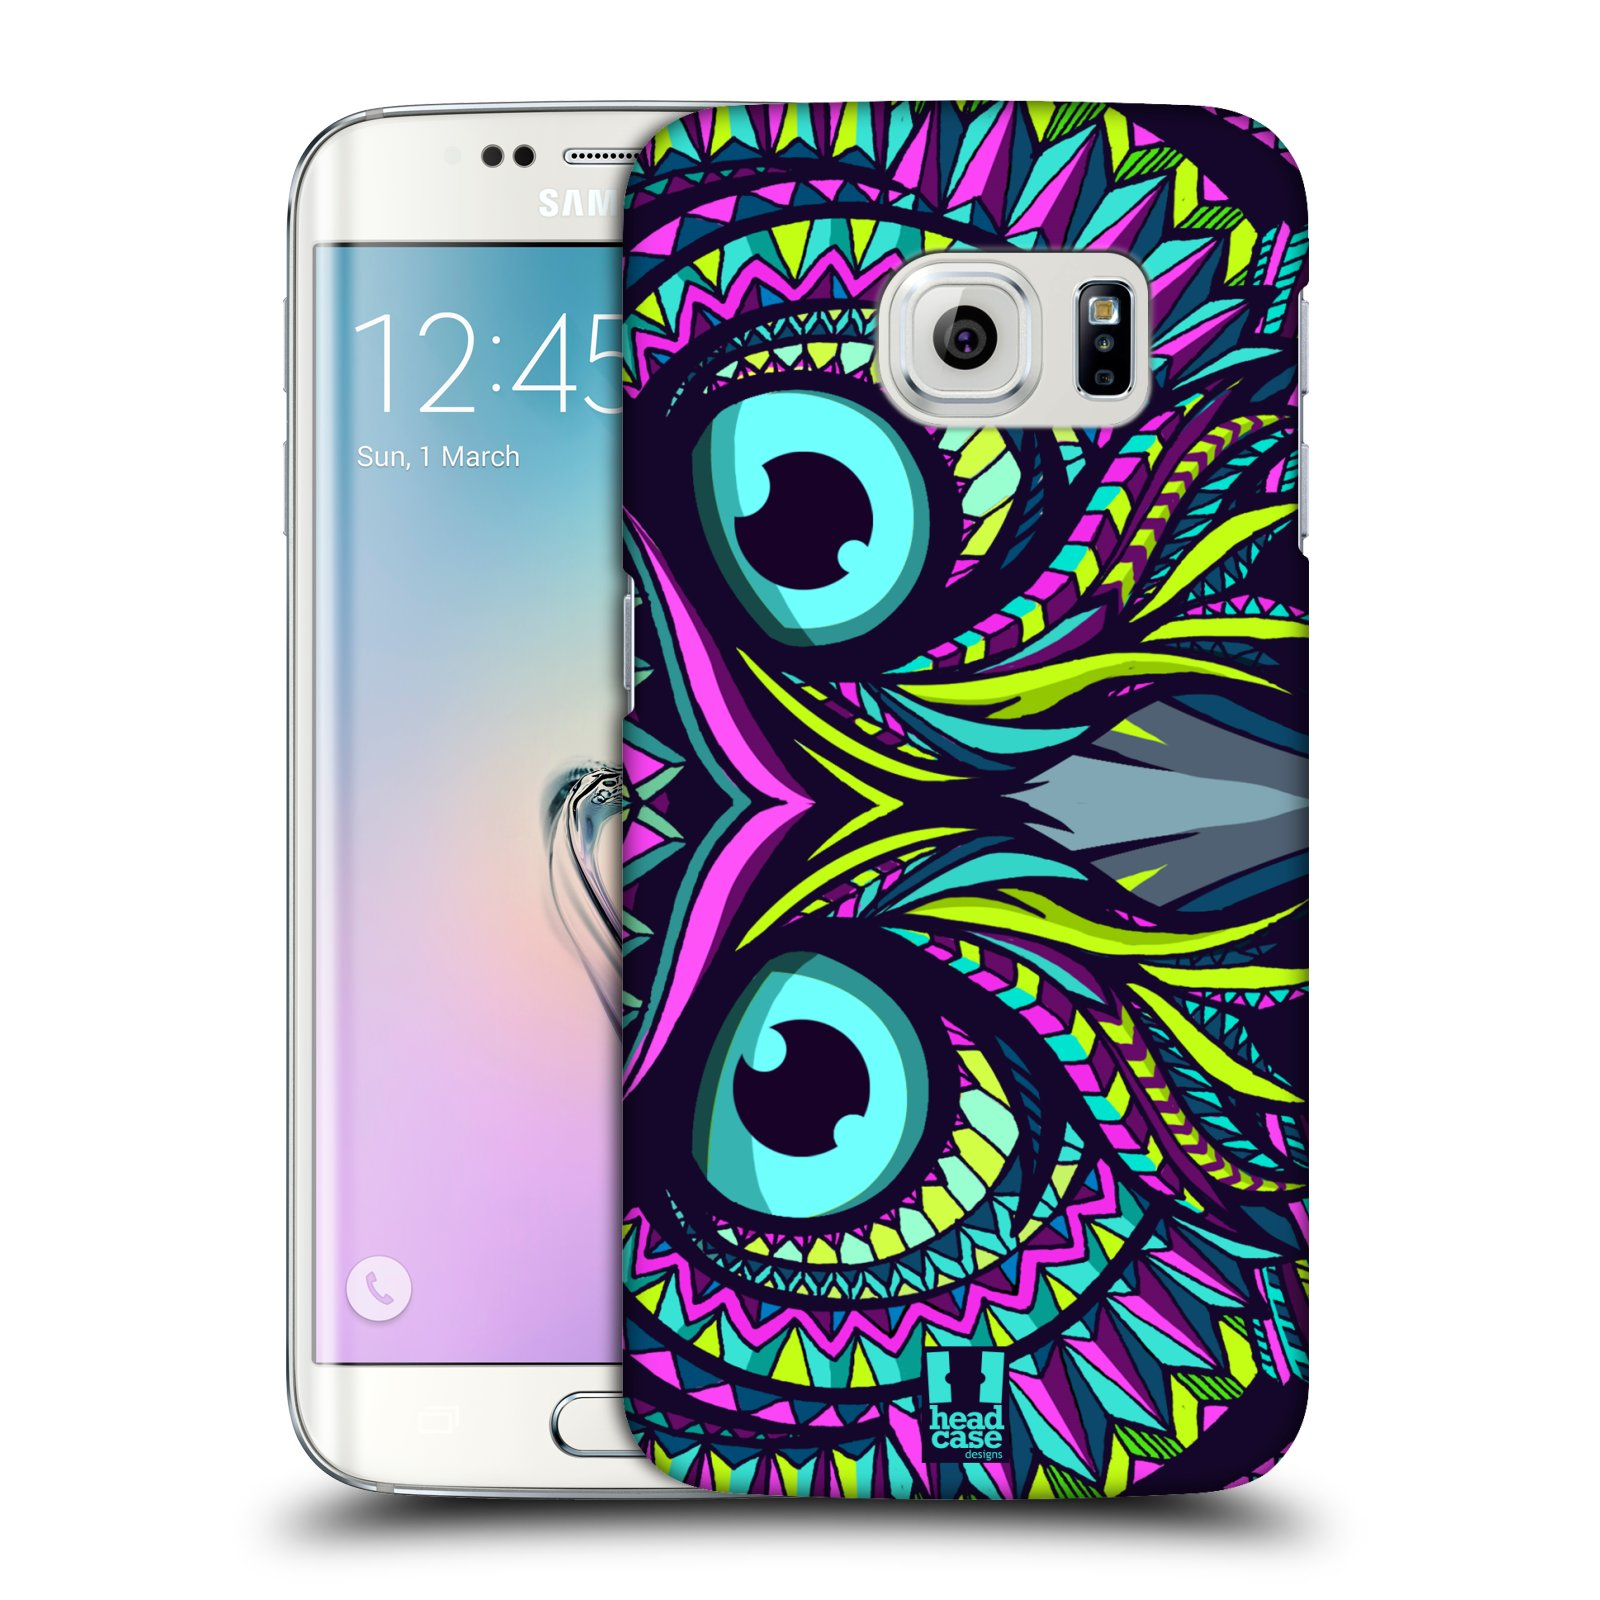 Plastové pouzdro na mobil Samsung Galaxy S6 Edge HEAD CASE AZTEC SOVA (Kryt či obal na mobilní telefon Samsung Galaxy S6 Edge SM-G925F)